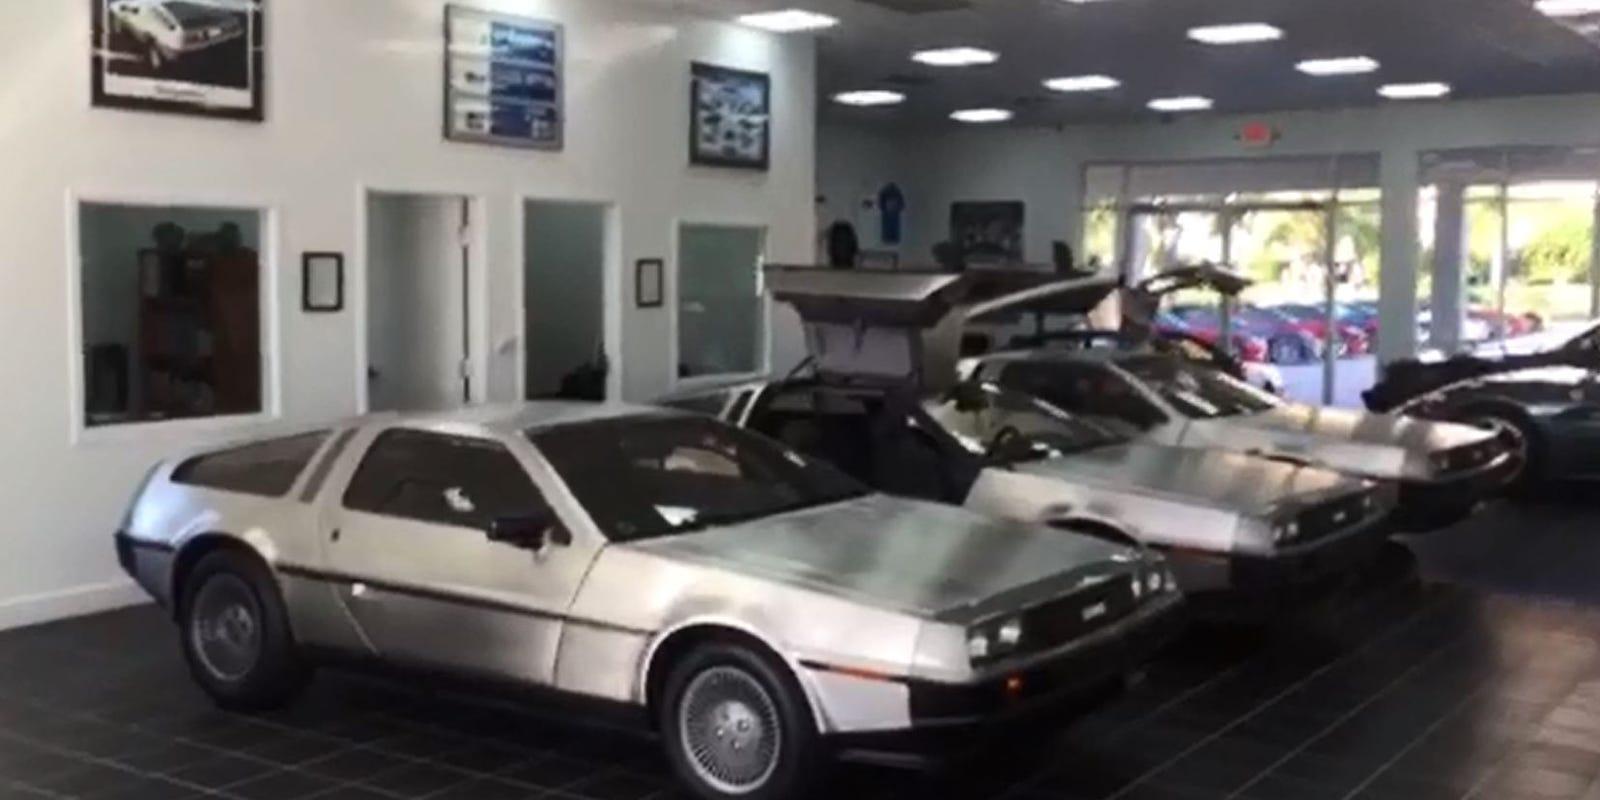 Deloreans For Sale >> Bonita Springs car dealership has 9 DeLoreans for sale